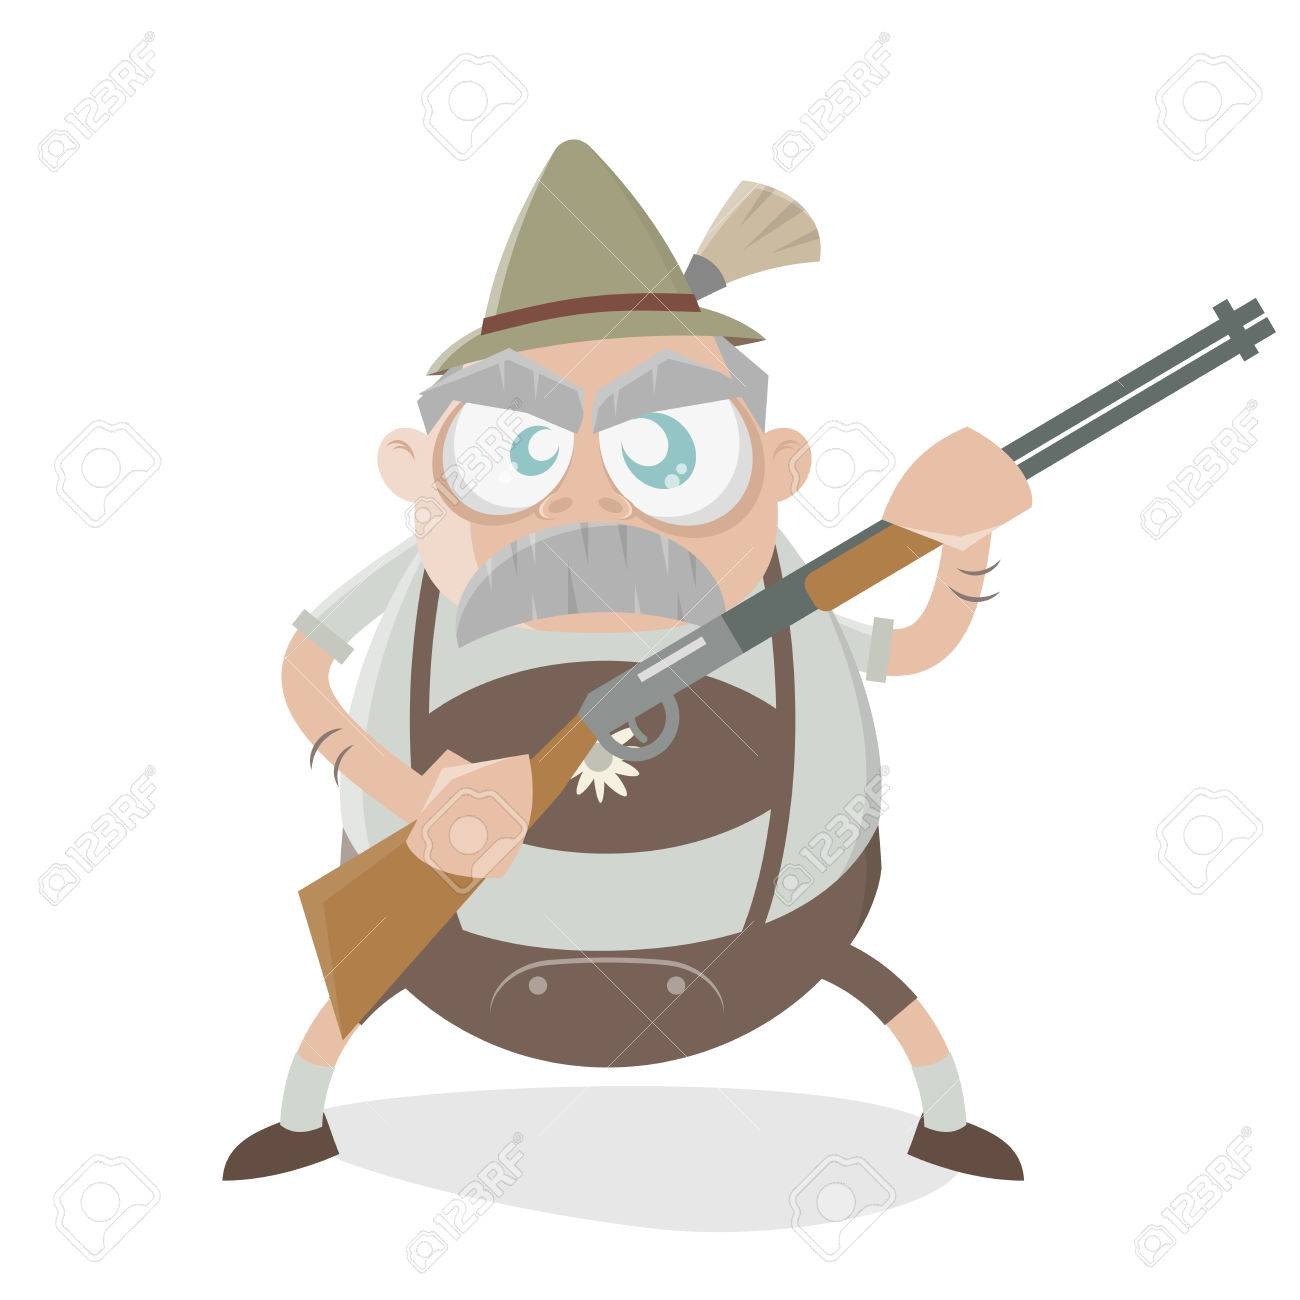 39198265-angry-bavarian-man-with-gun-Stock-Vector